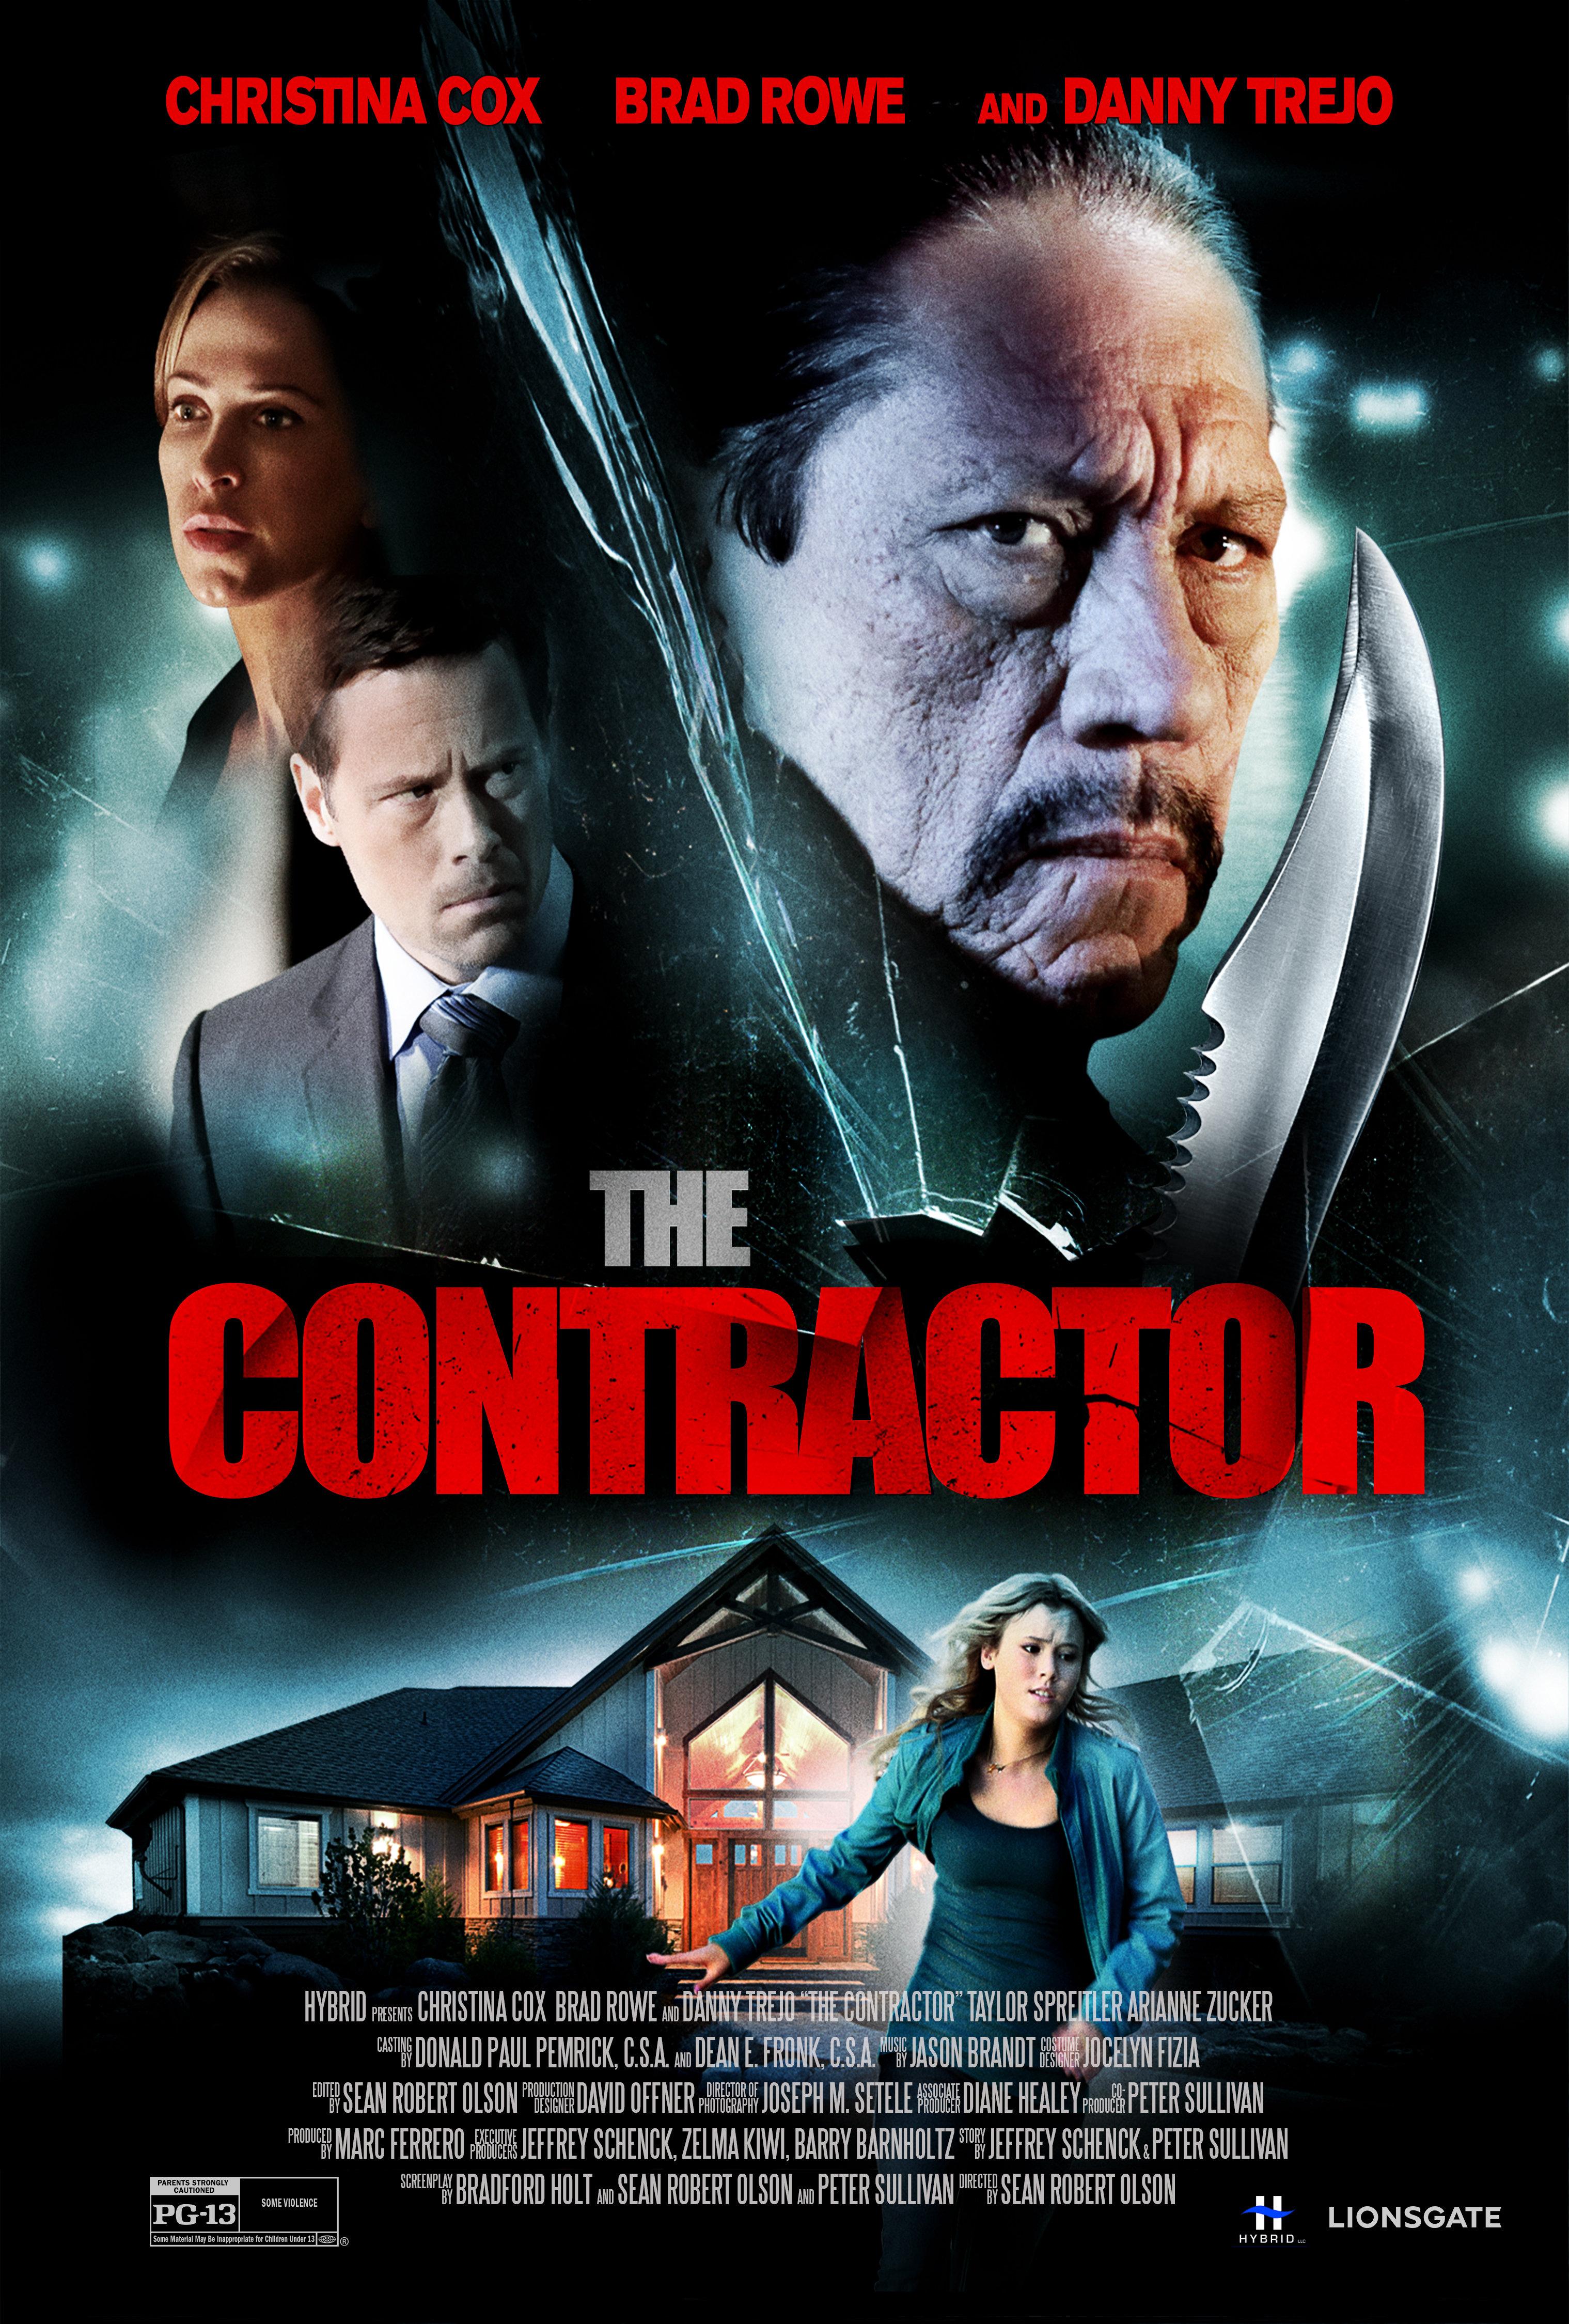 The Contractor 2013 Imdb